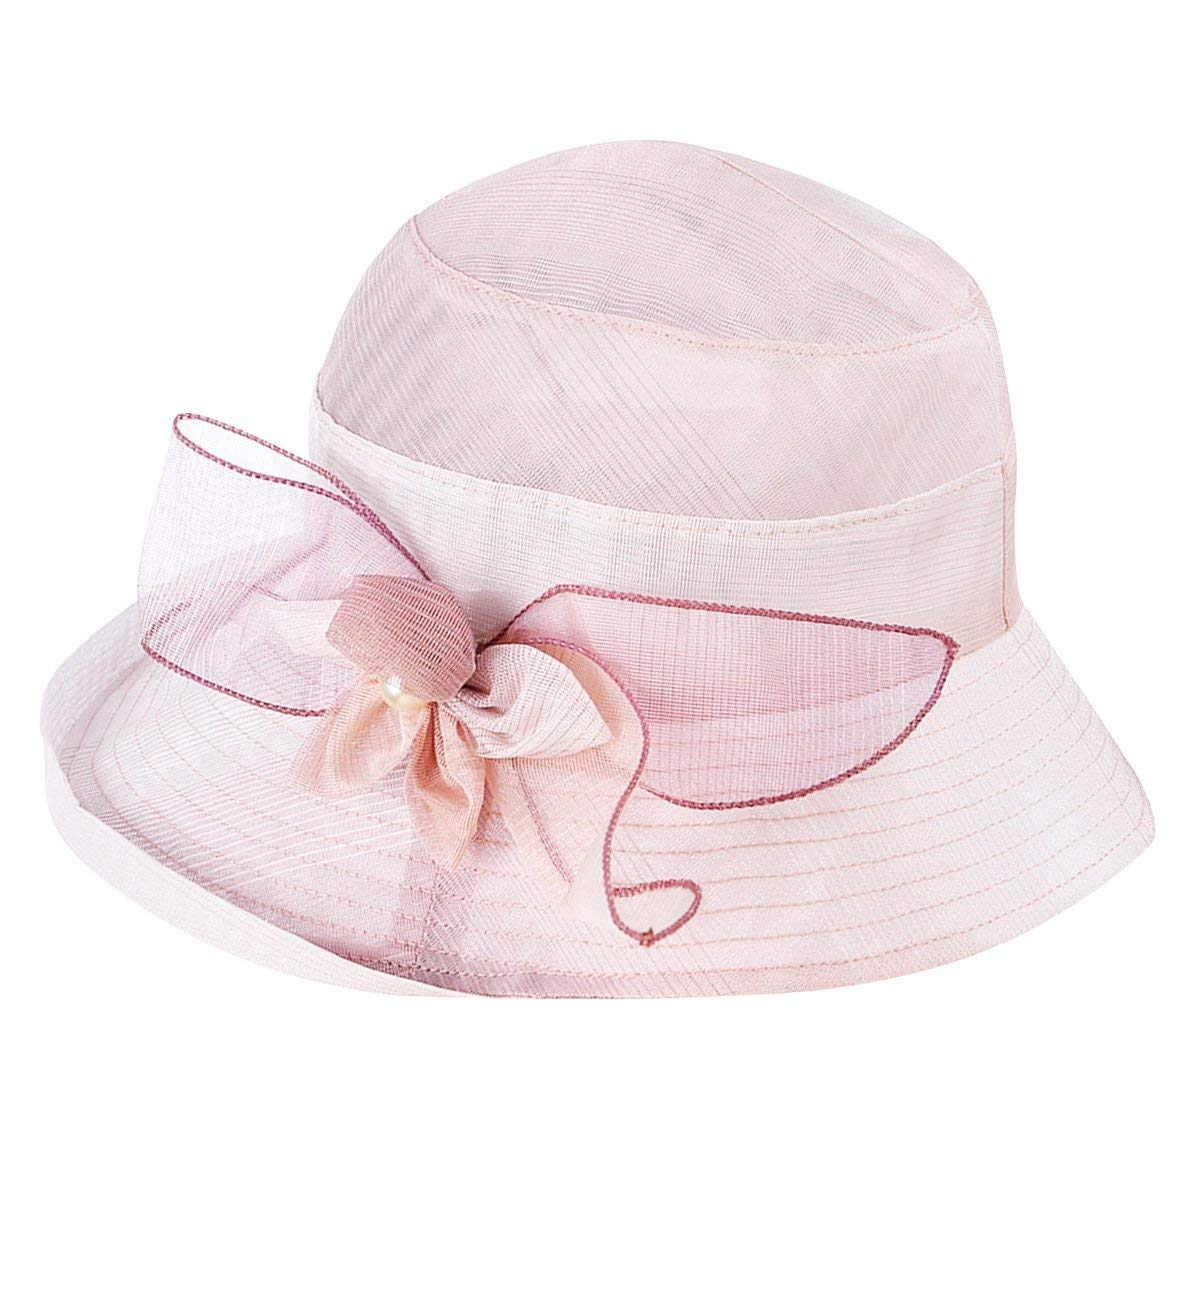 bb90e4576b8 Get Quotations · Sumolux Women Derby Church Dress Sun Hats Wide Brim  Flounce Cocktail Tea Party Bridal Dress Wedding